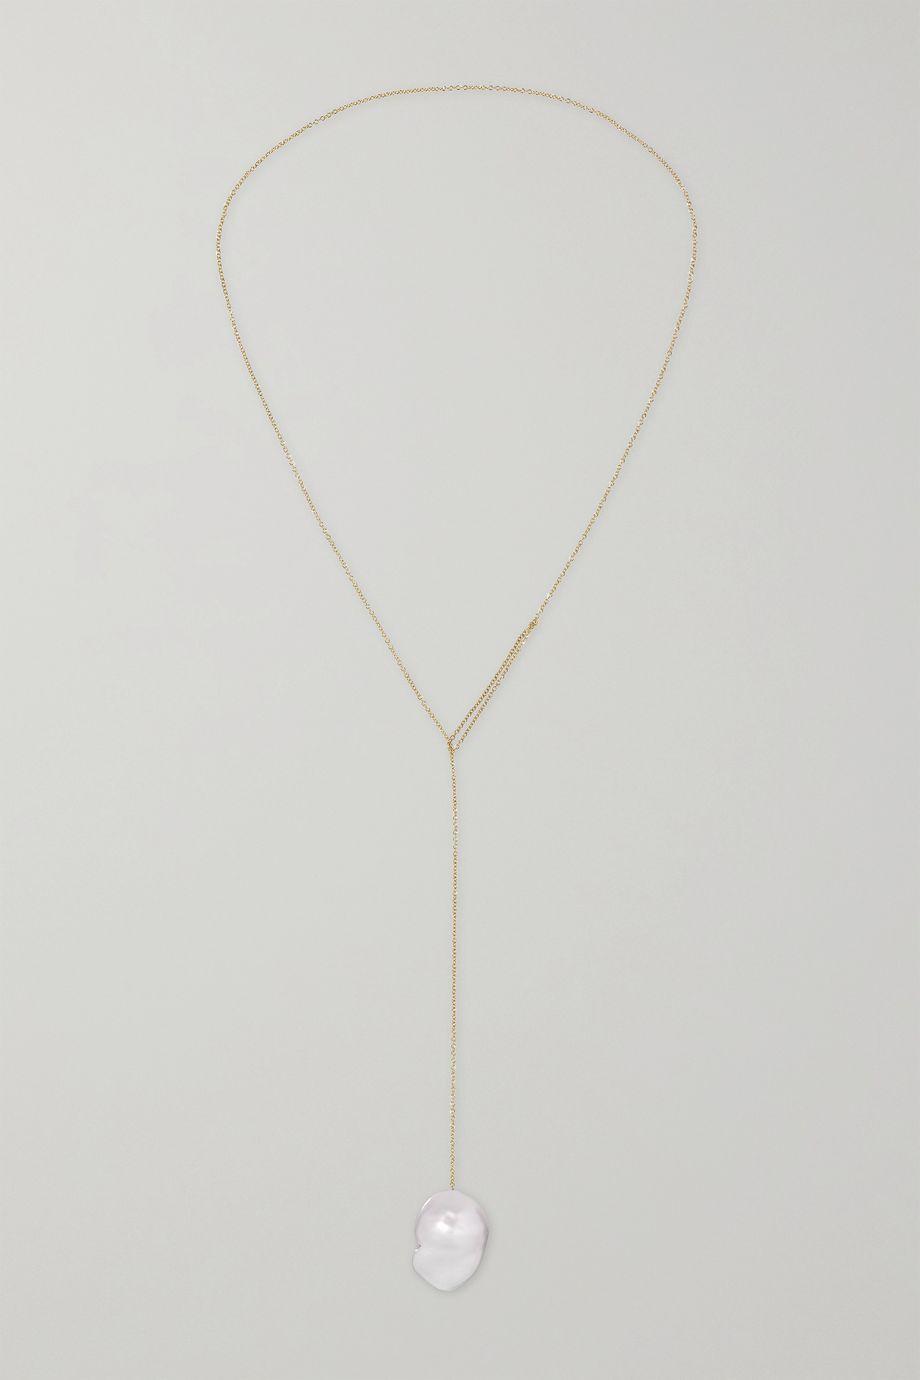 Sophie Bille Brahe Sirene 14-karat gold pearl necklace